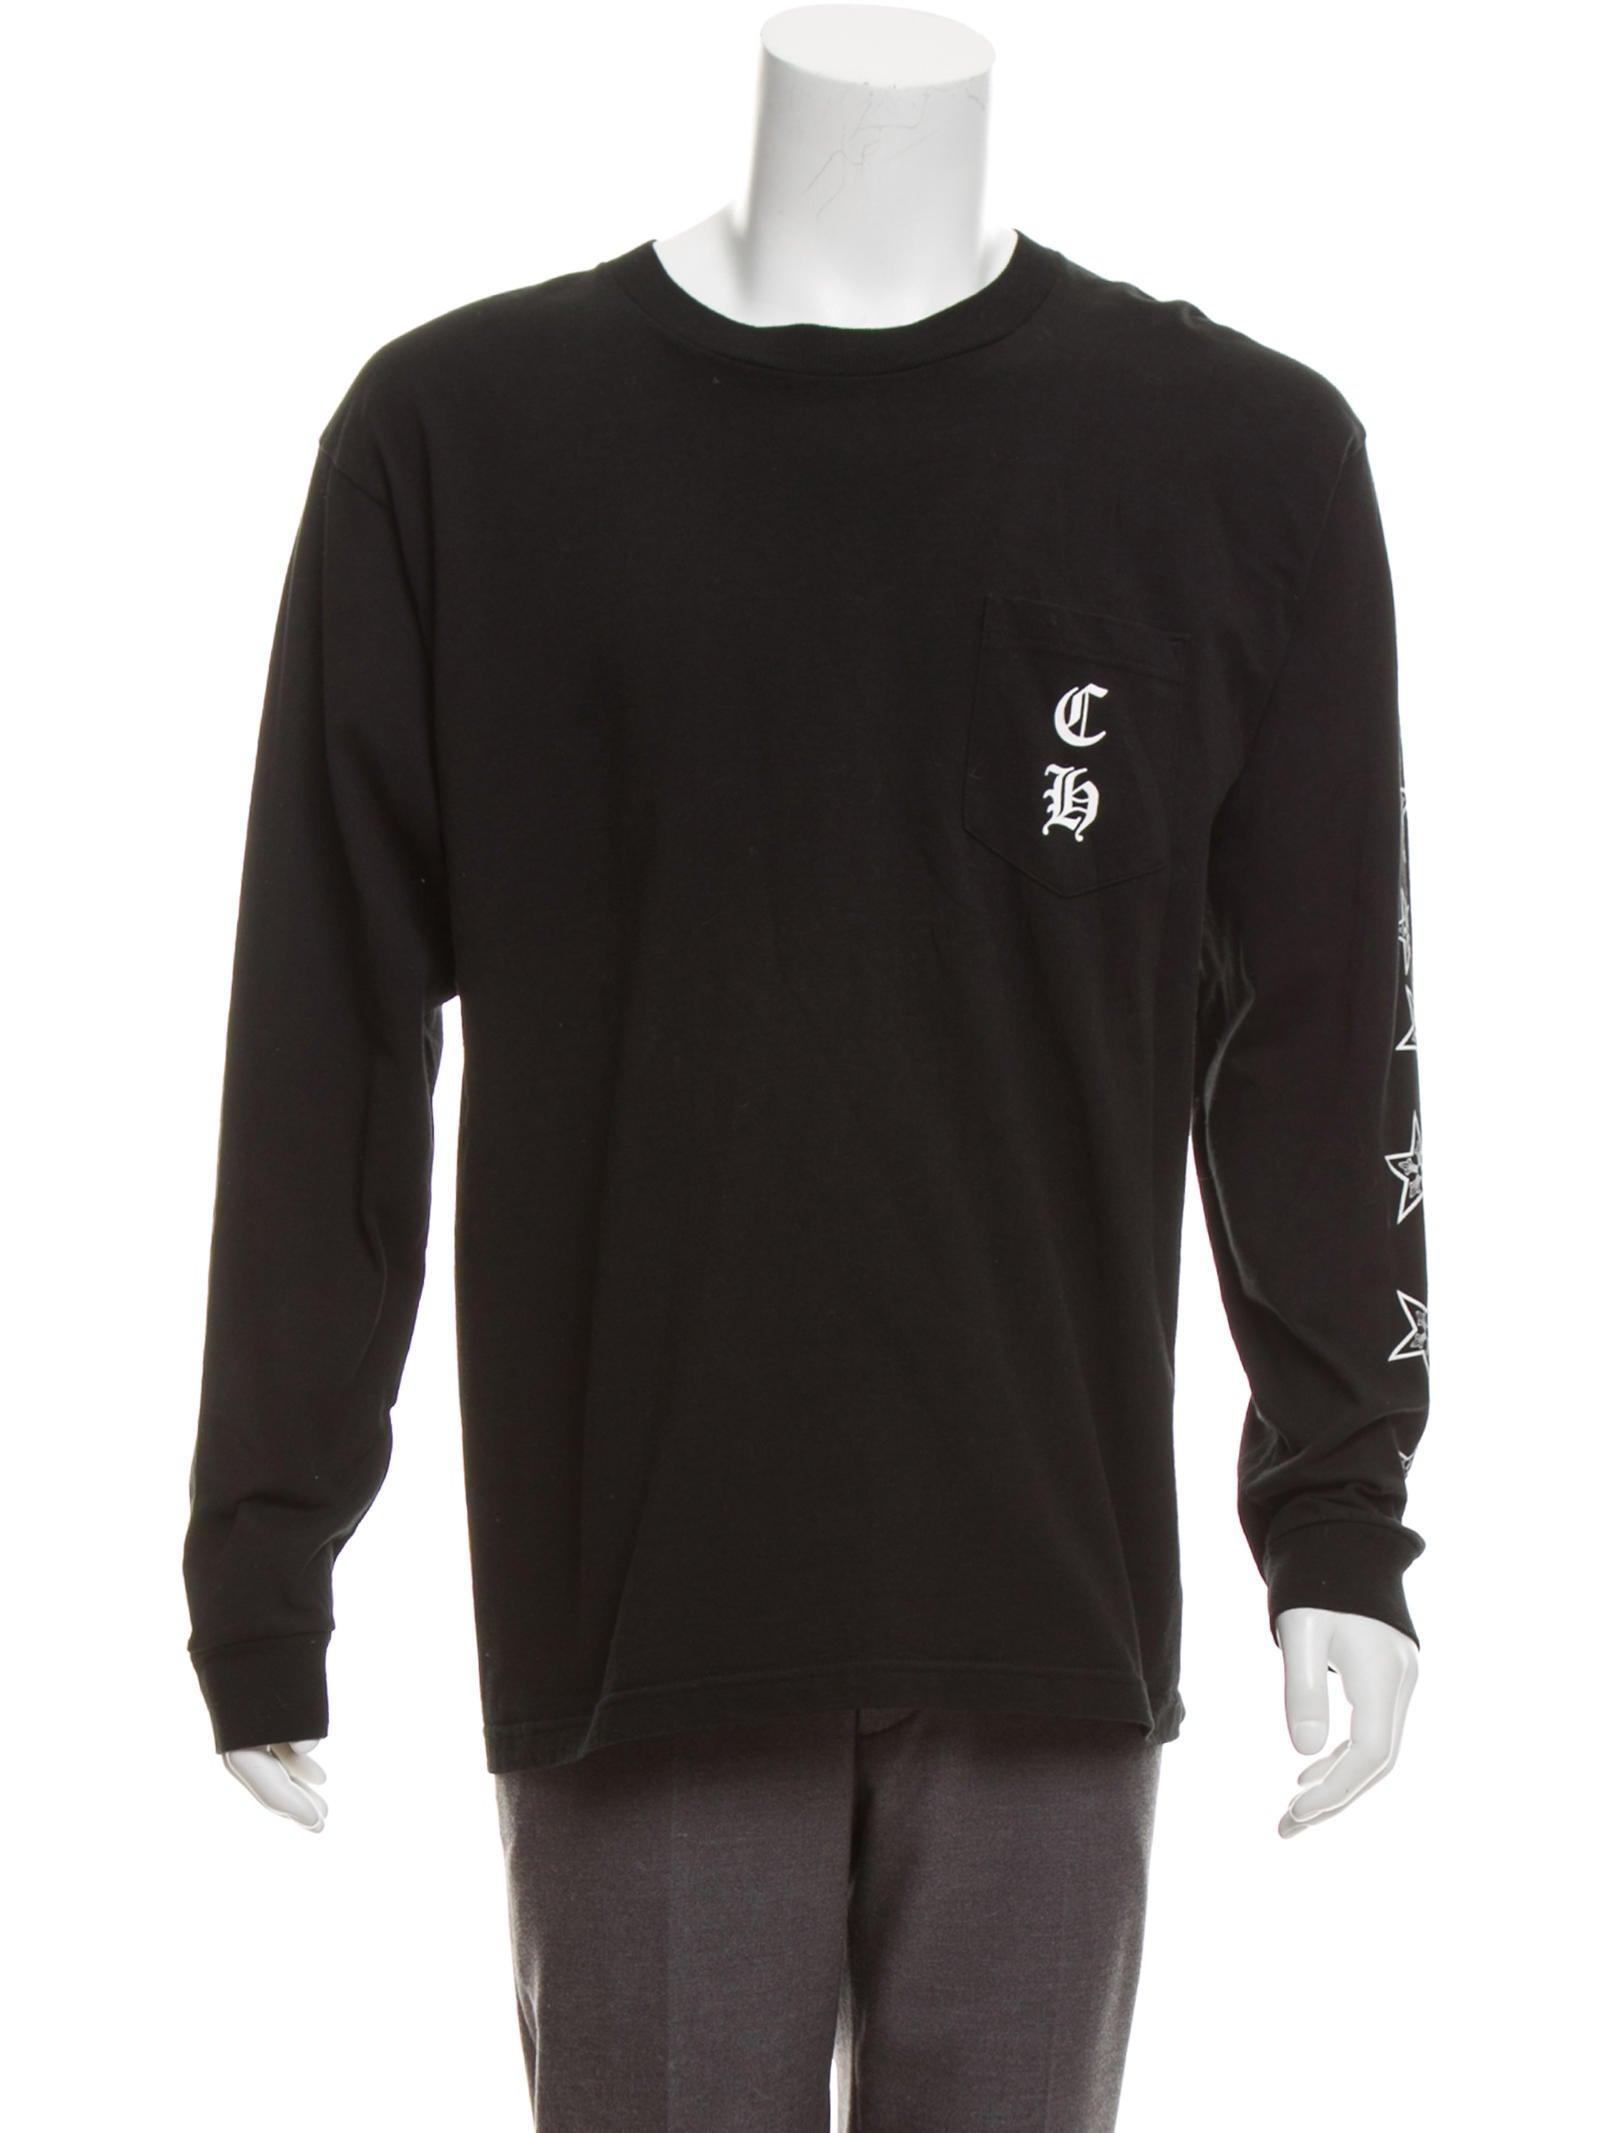 12919eb1e073 Chrome Hearts Long Sleeve Graphic Logo T-Shirt - Clothing - CHH25001 ...